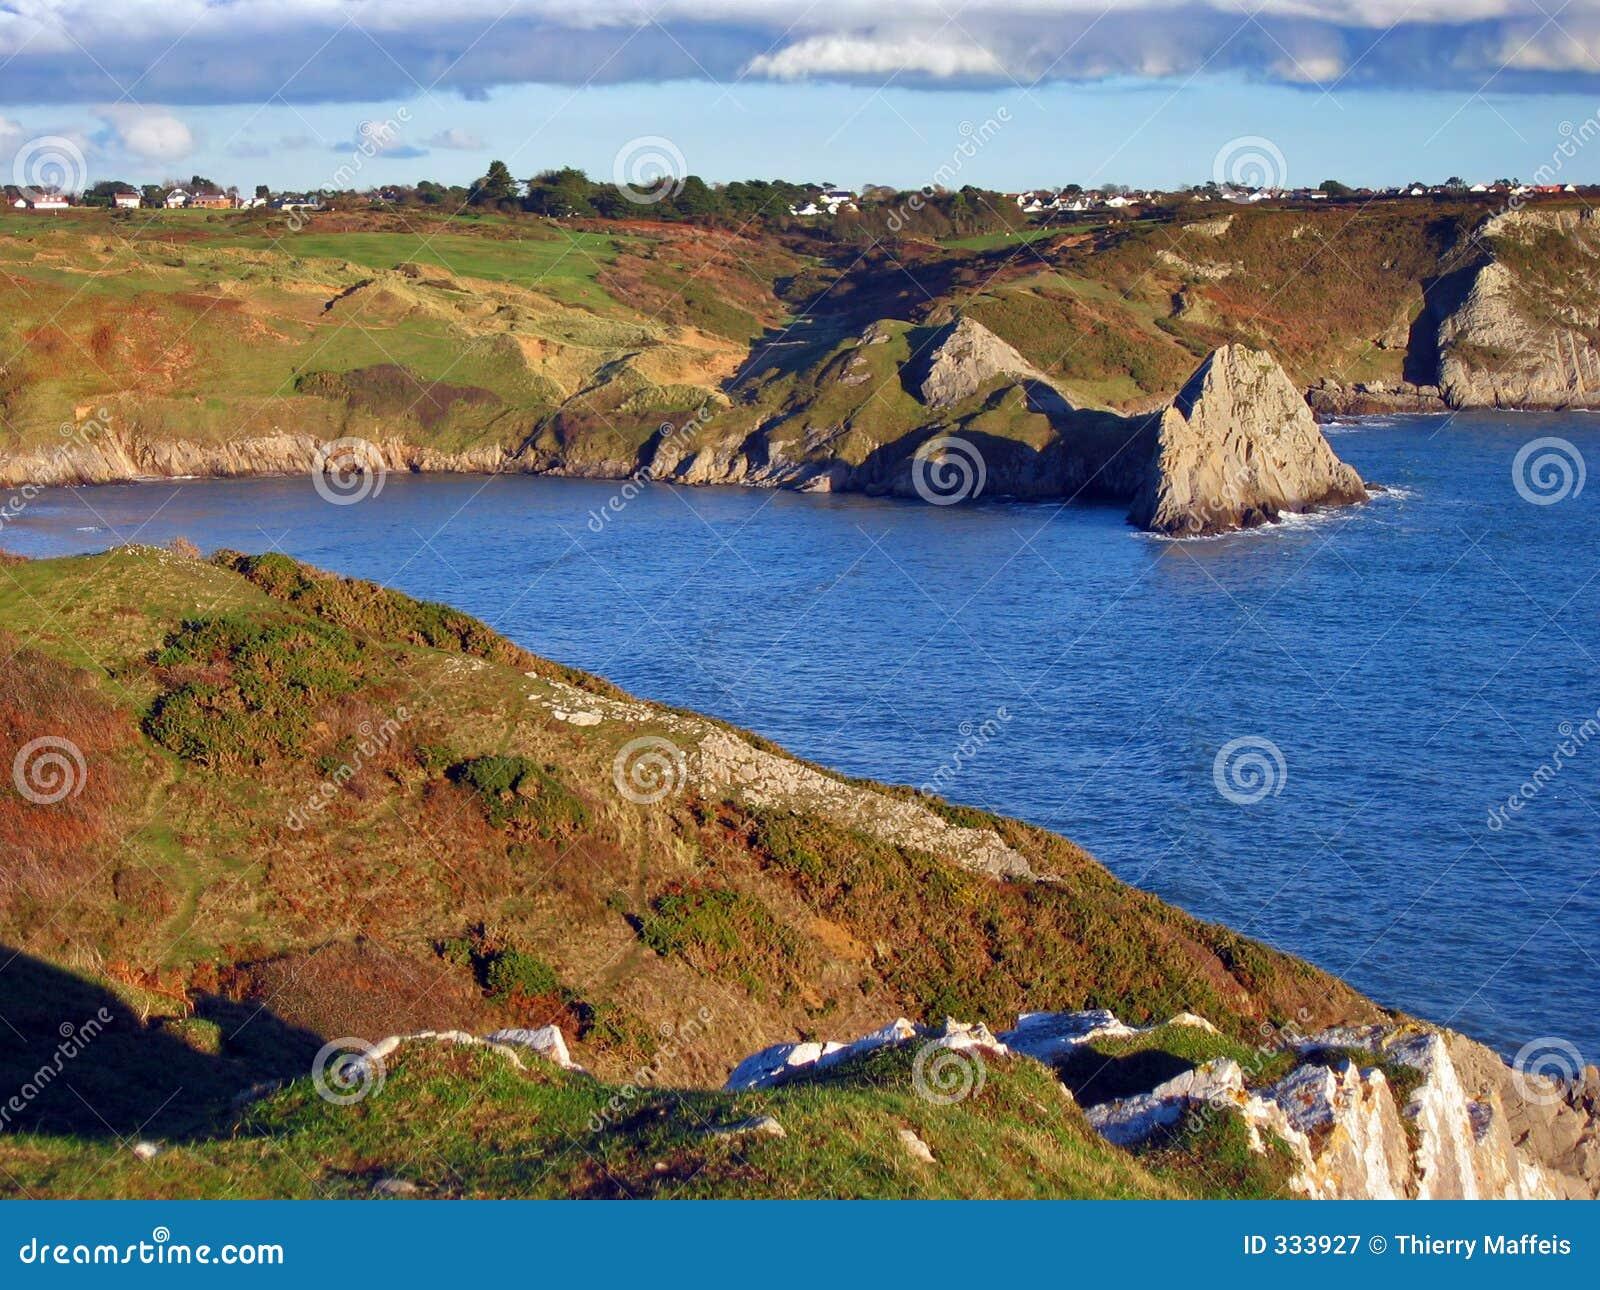 South wales coastline